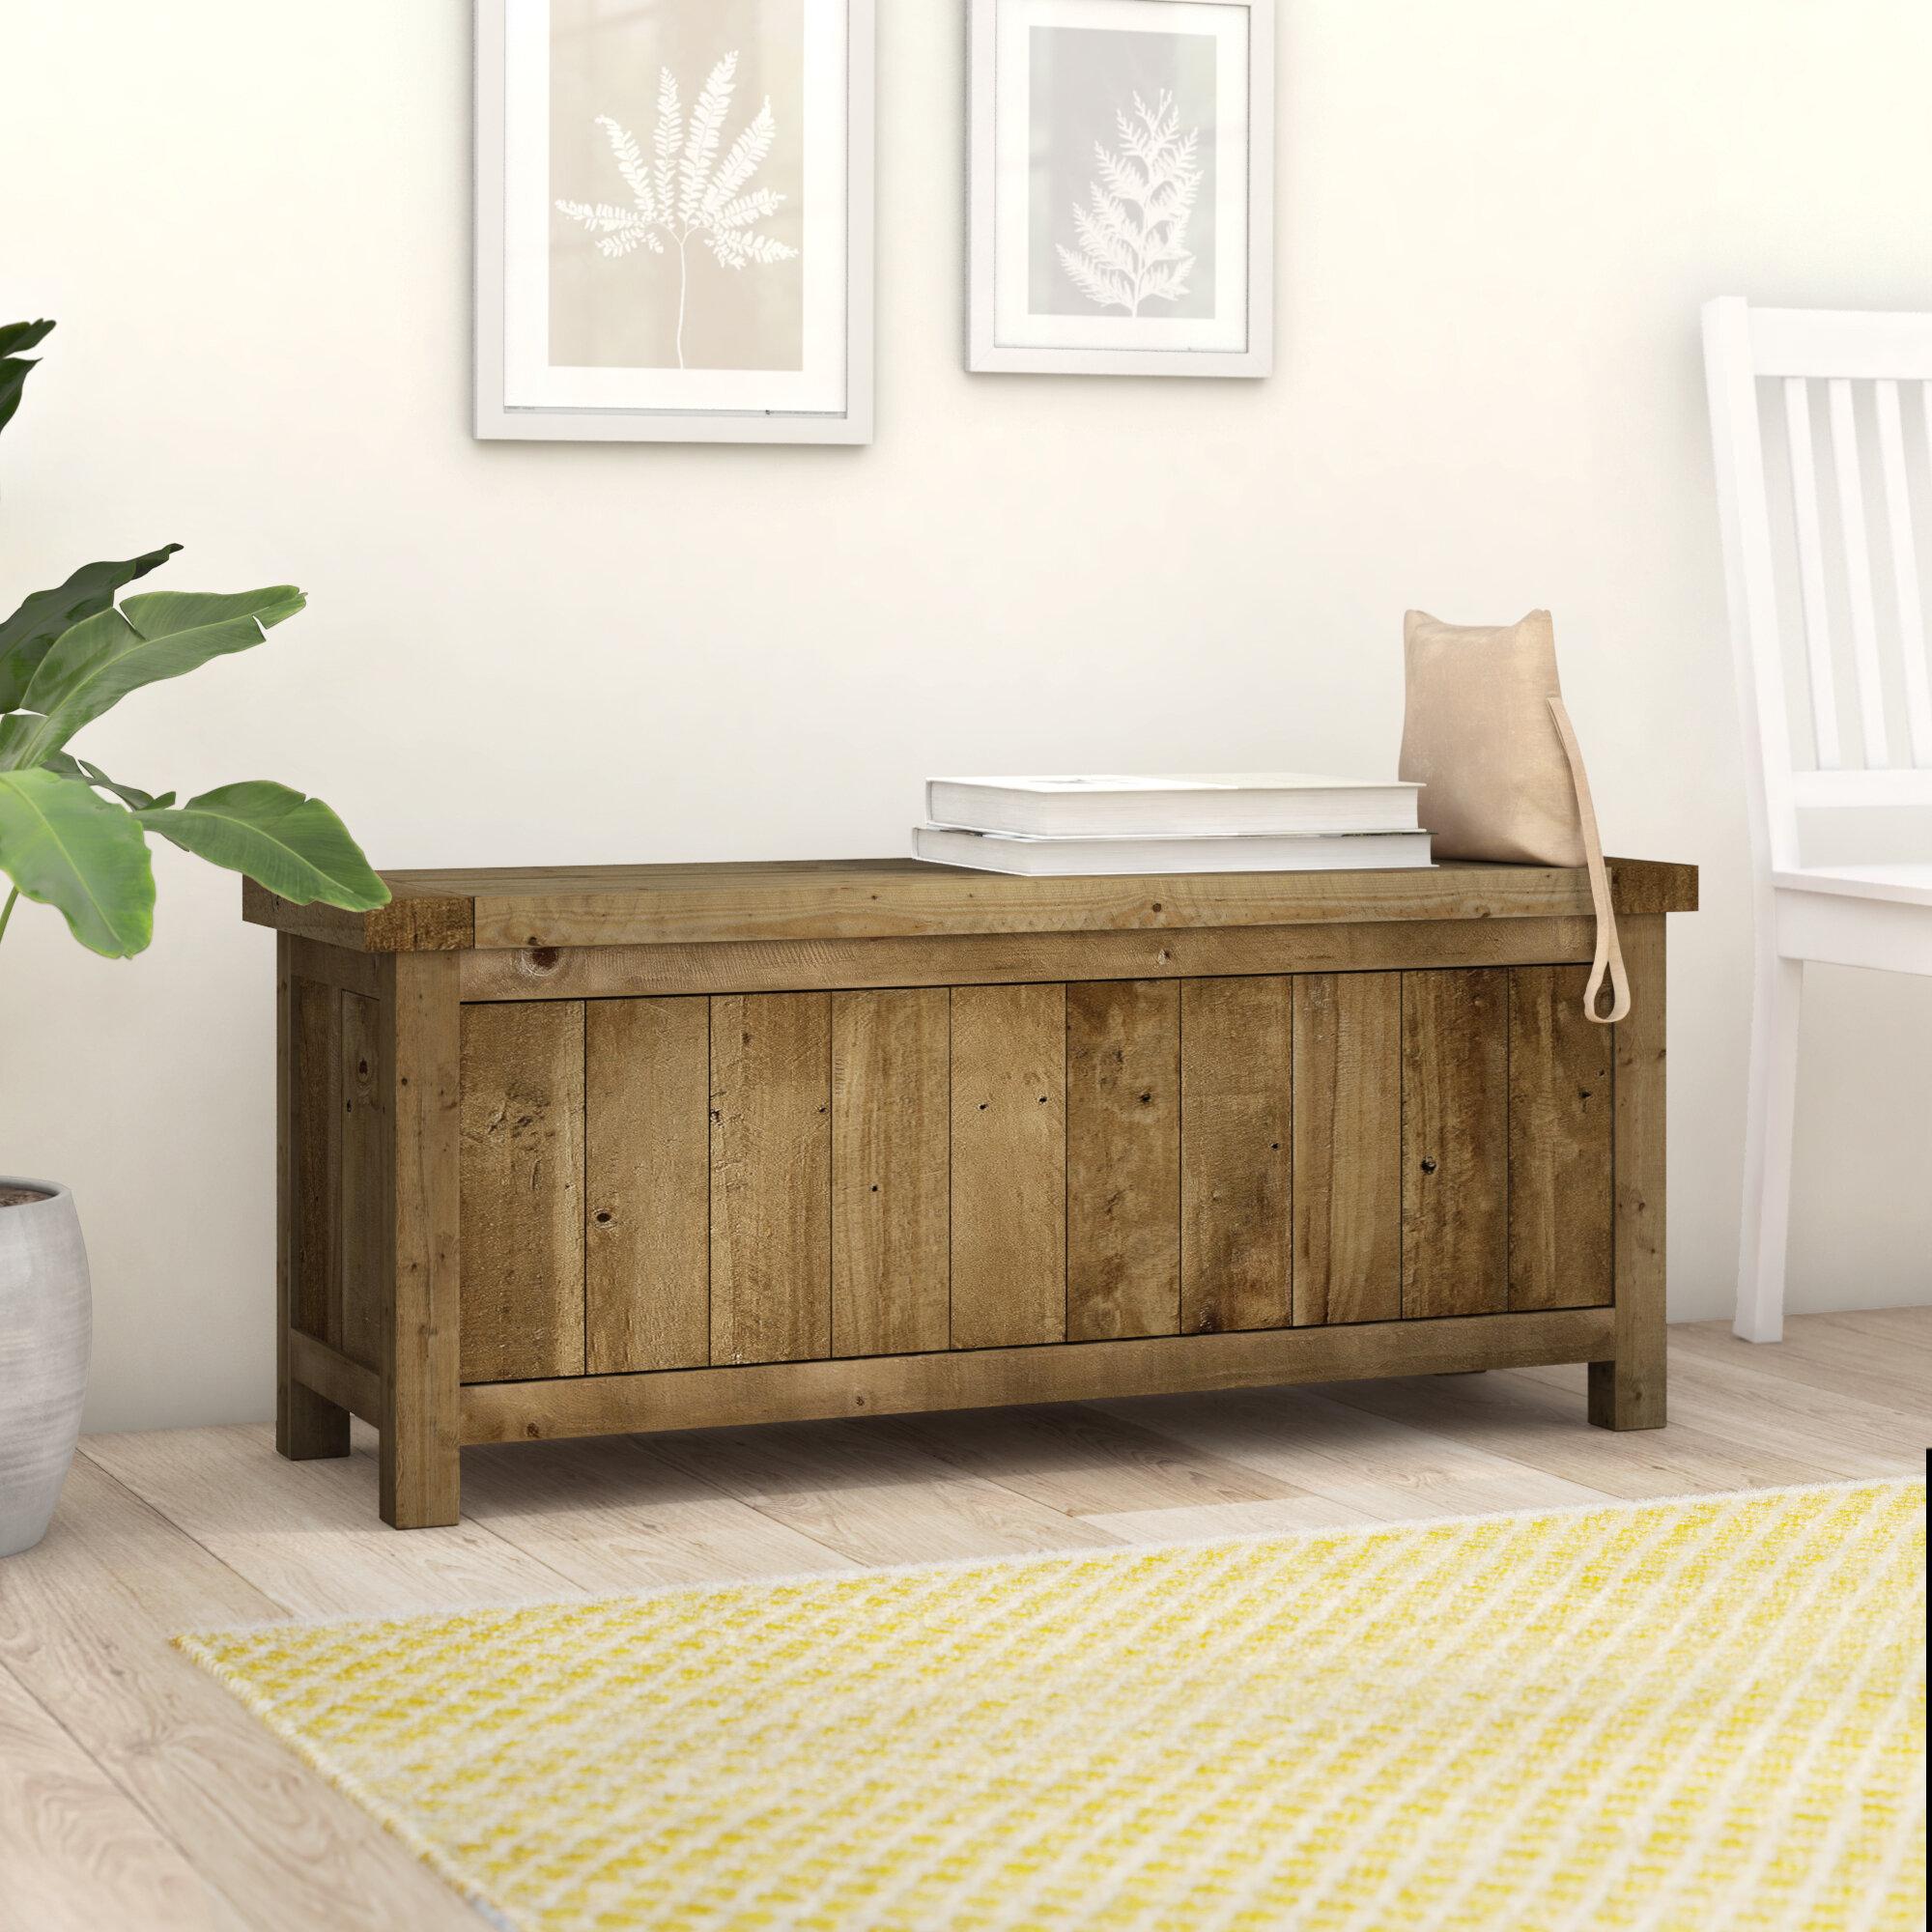 Amina Wood Storage Bench